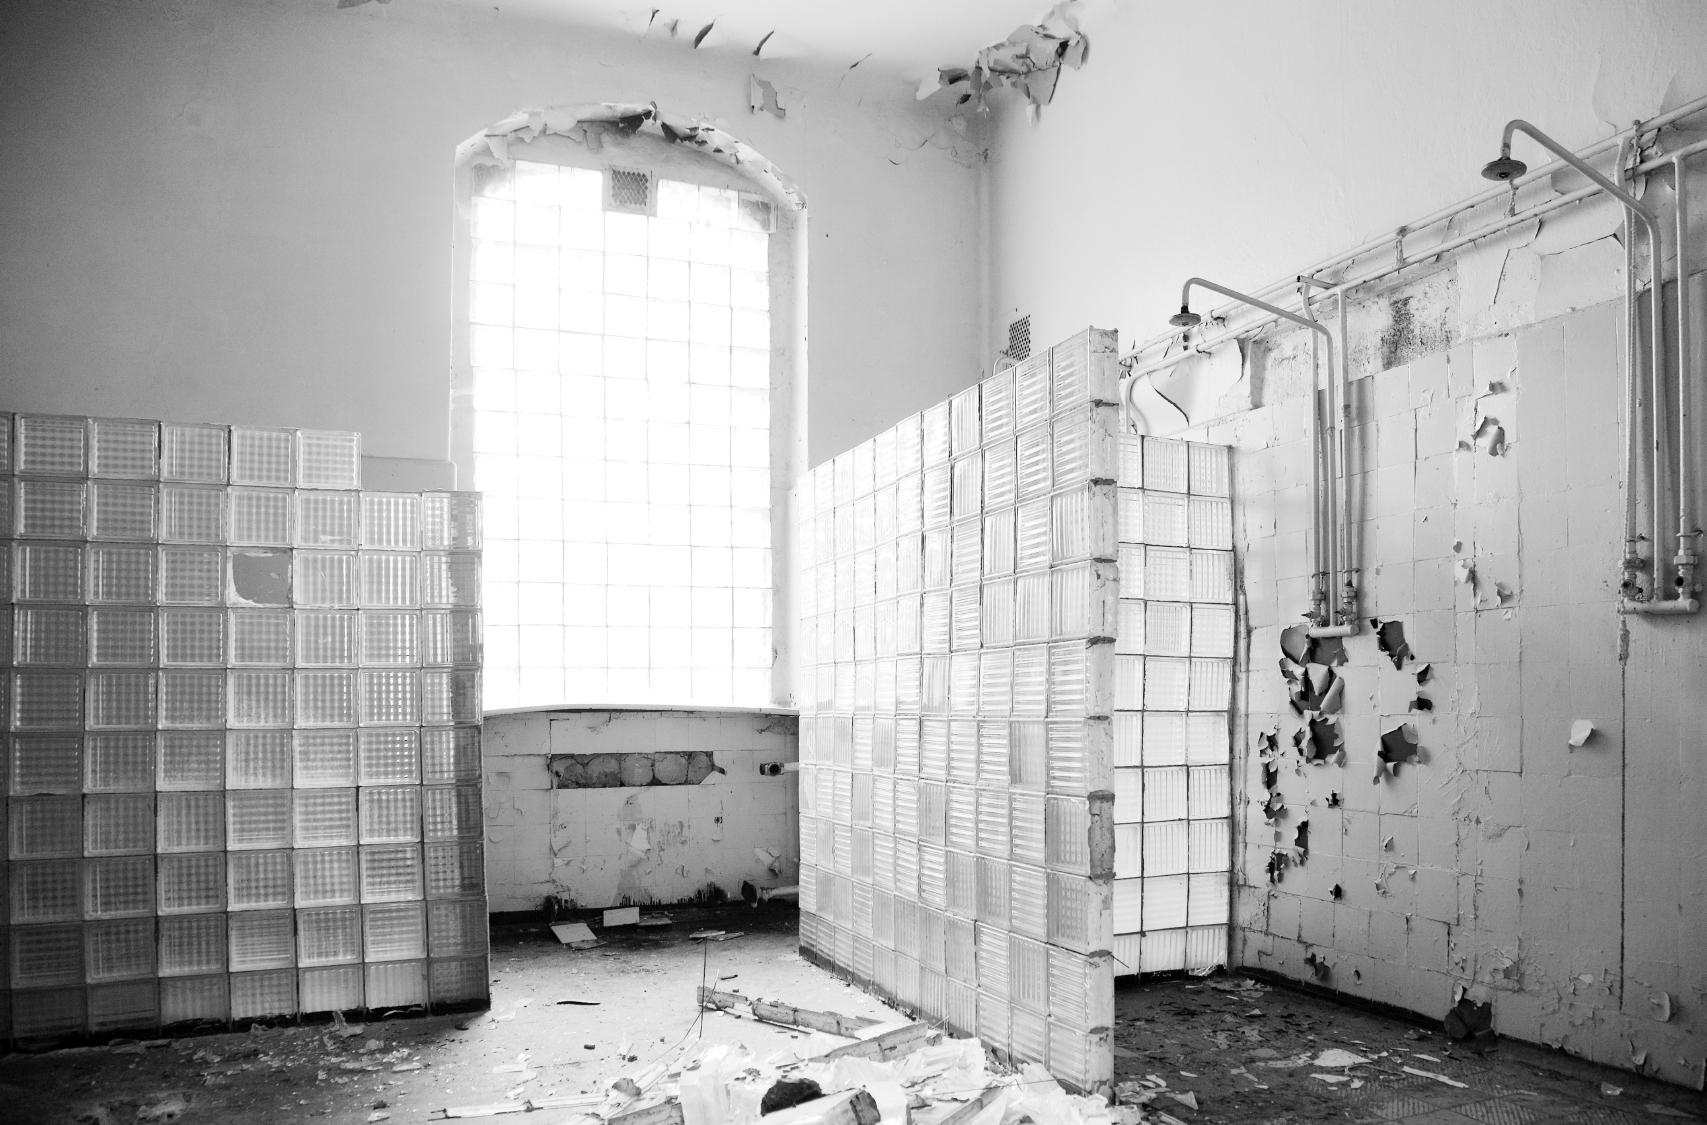 Locker room technology in a post shower era